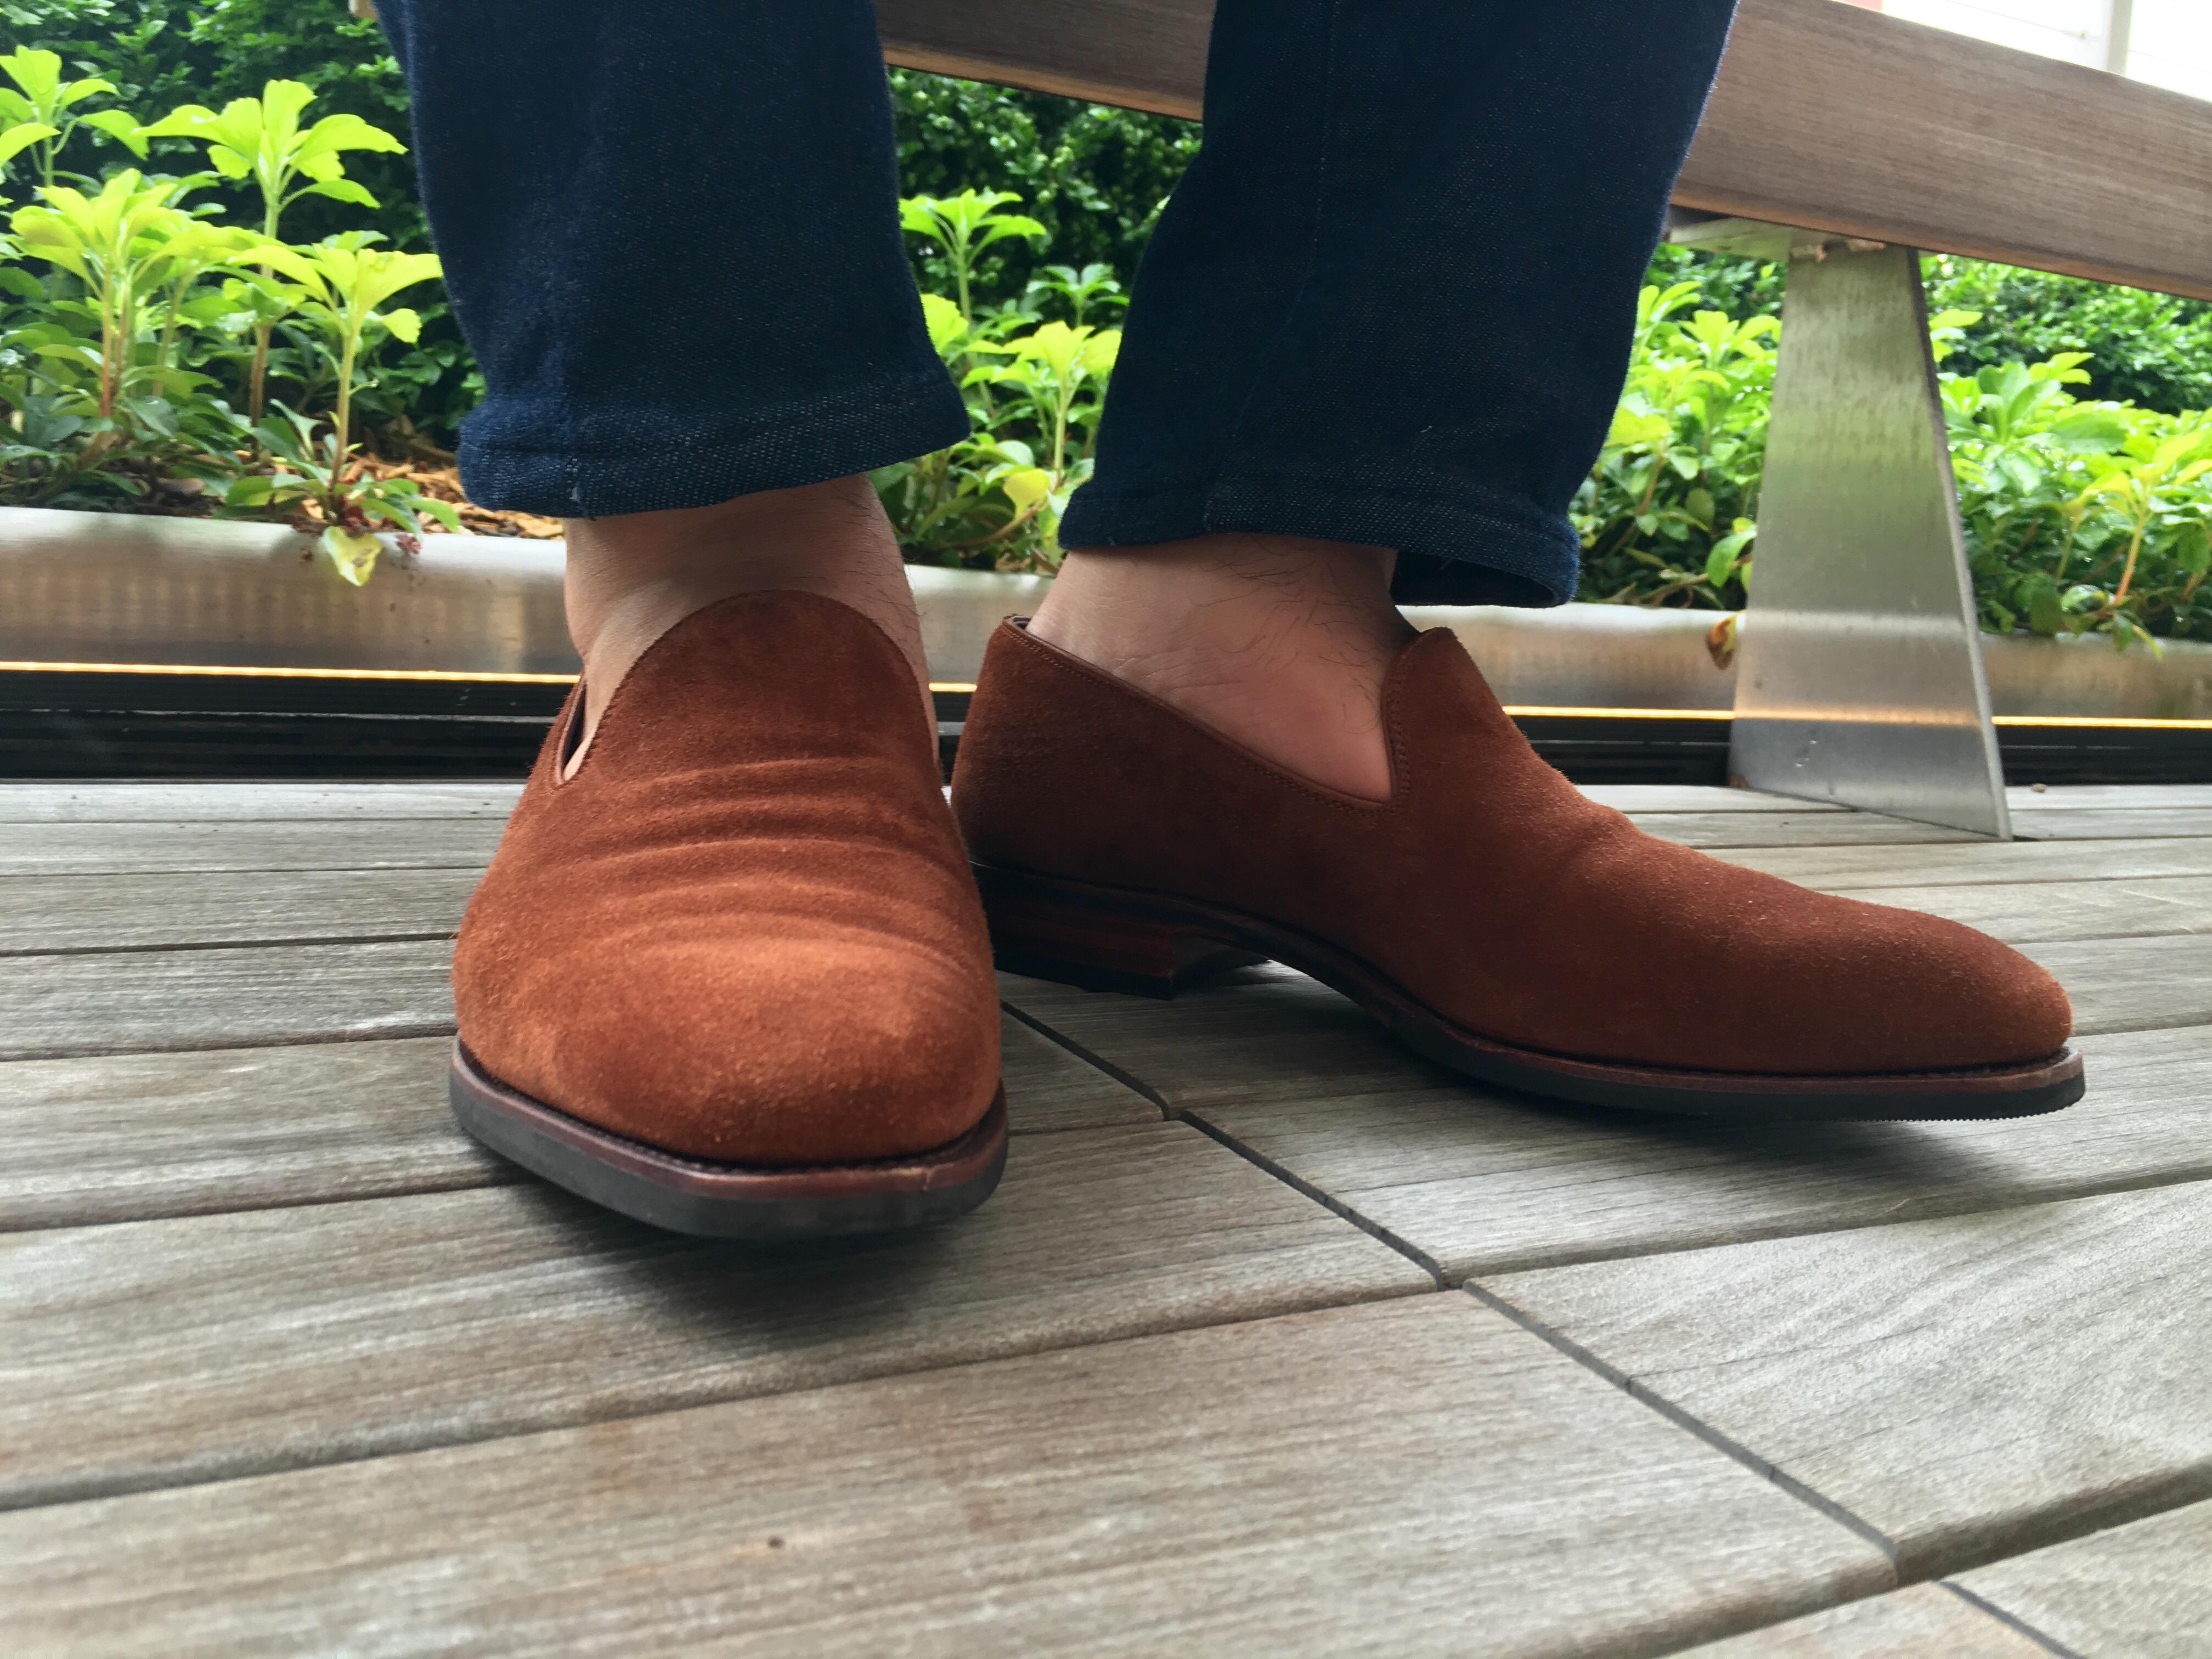 63246a67a8c Carmina Shoes - Definitive Thread (reviews